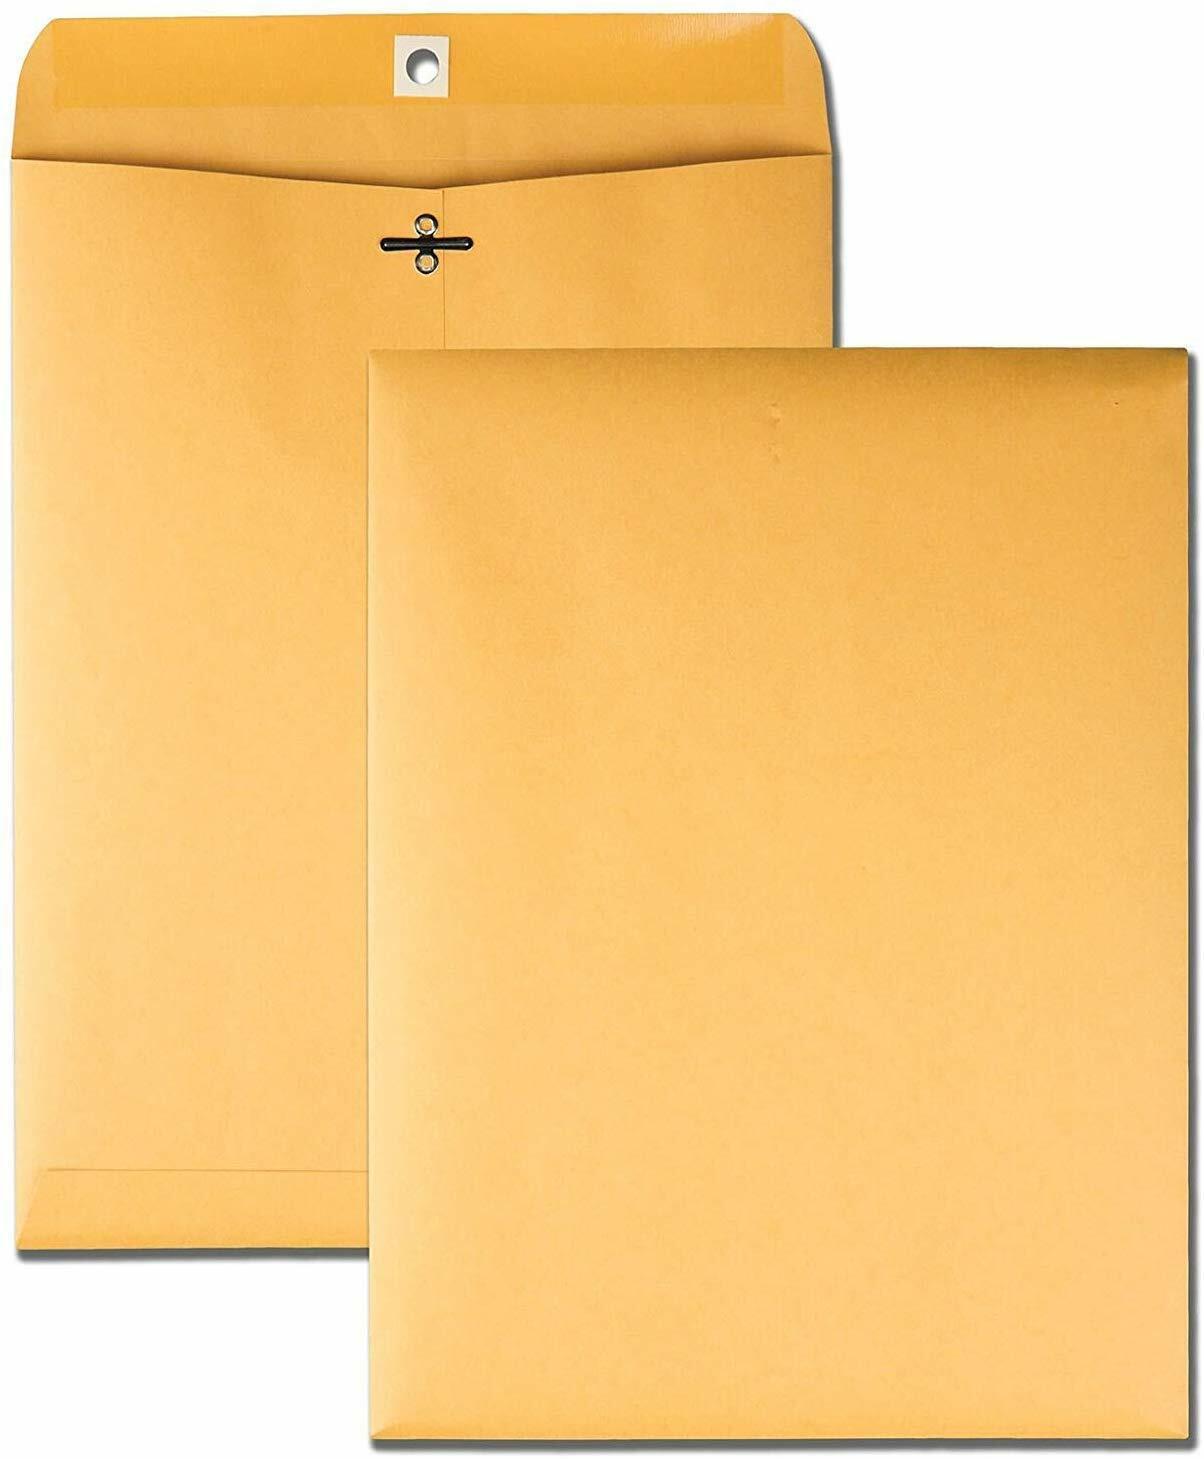 Brown Kraft Catalog Clasp Envelopes, Gummed Seal, 10 x 13, 2